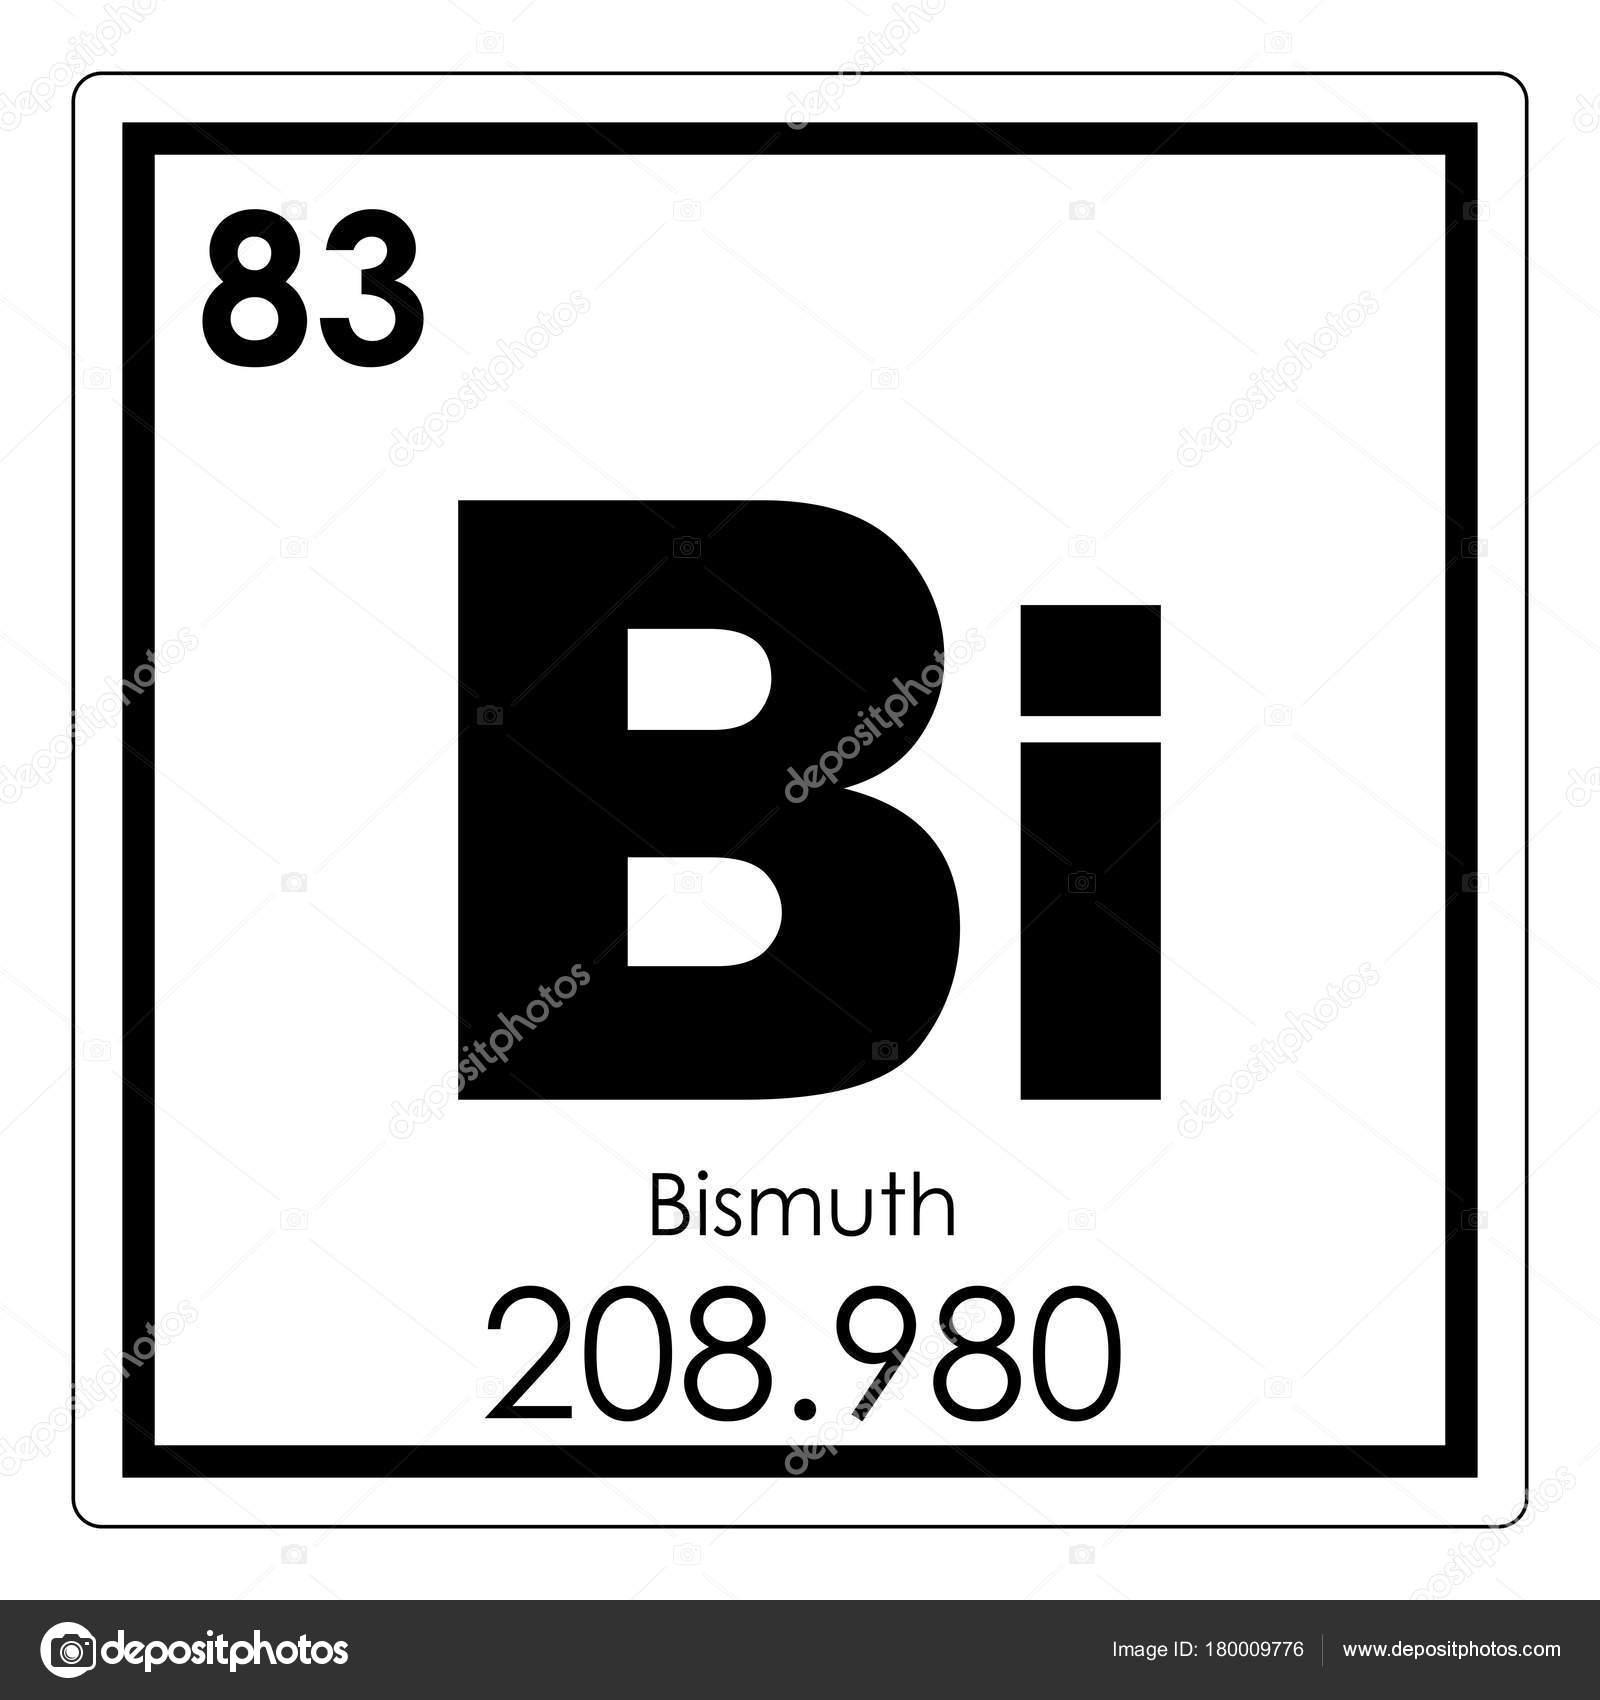 Bismuth chemical element stock photo tony4urban 180009776 bismuth chemical element periodic table science symbol photo by tony4urban buycottarizona